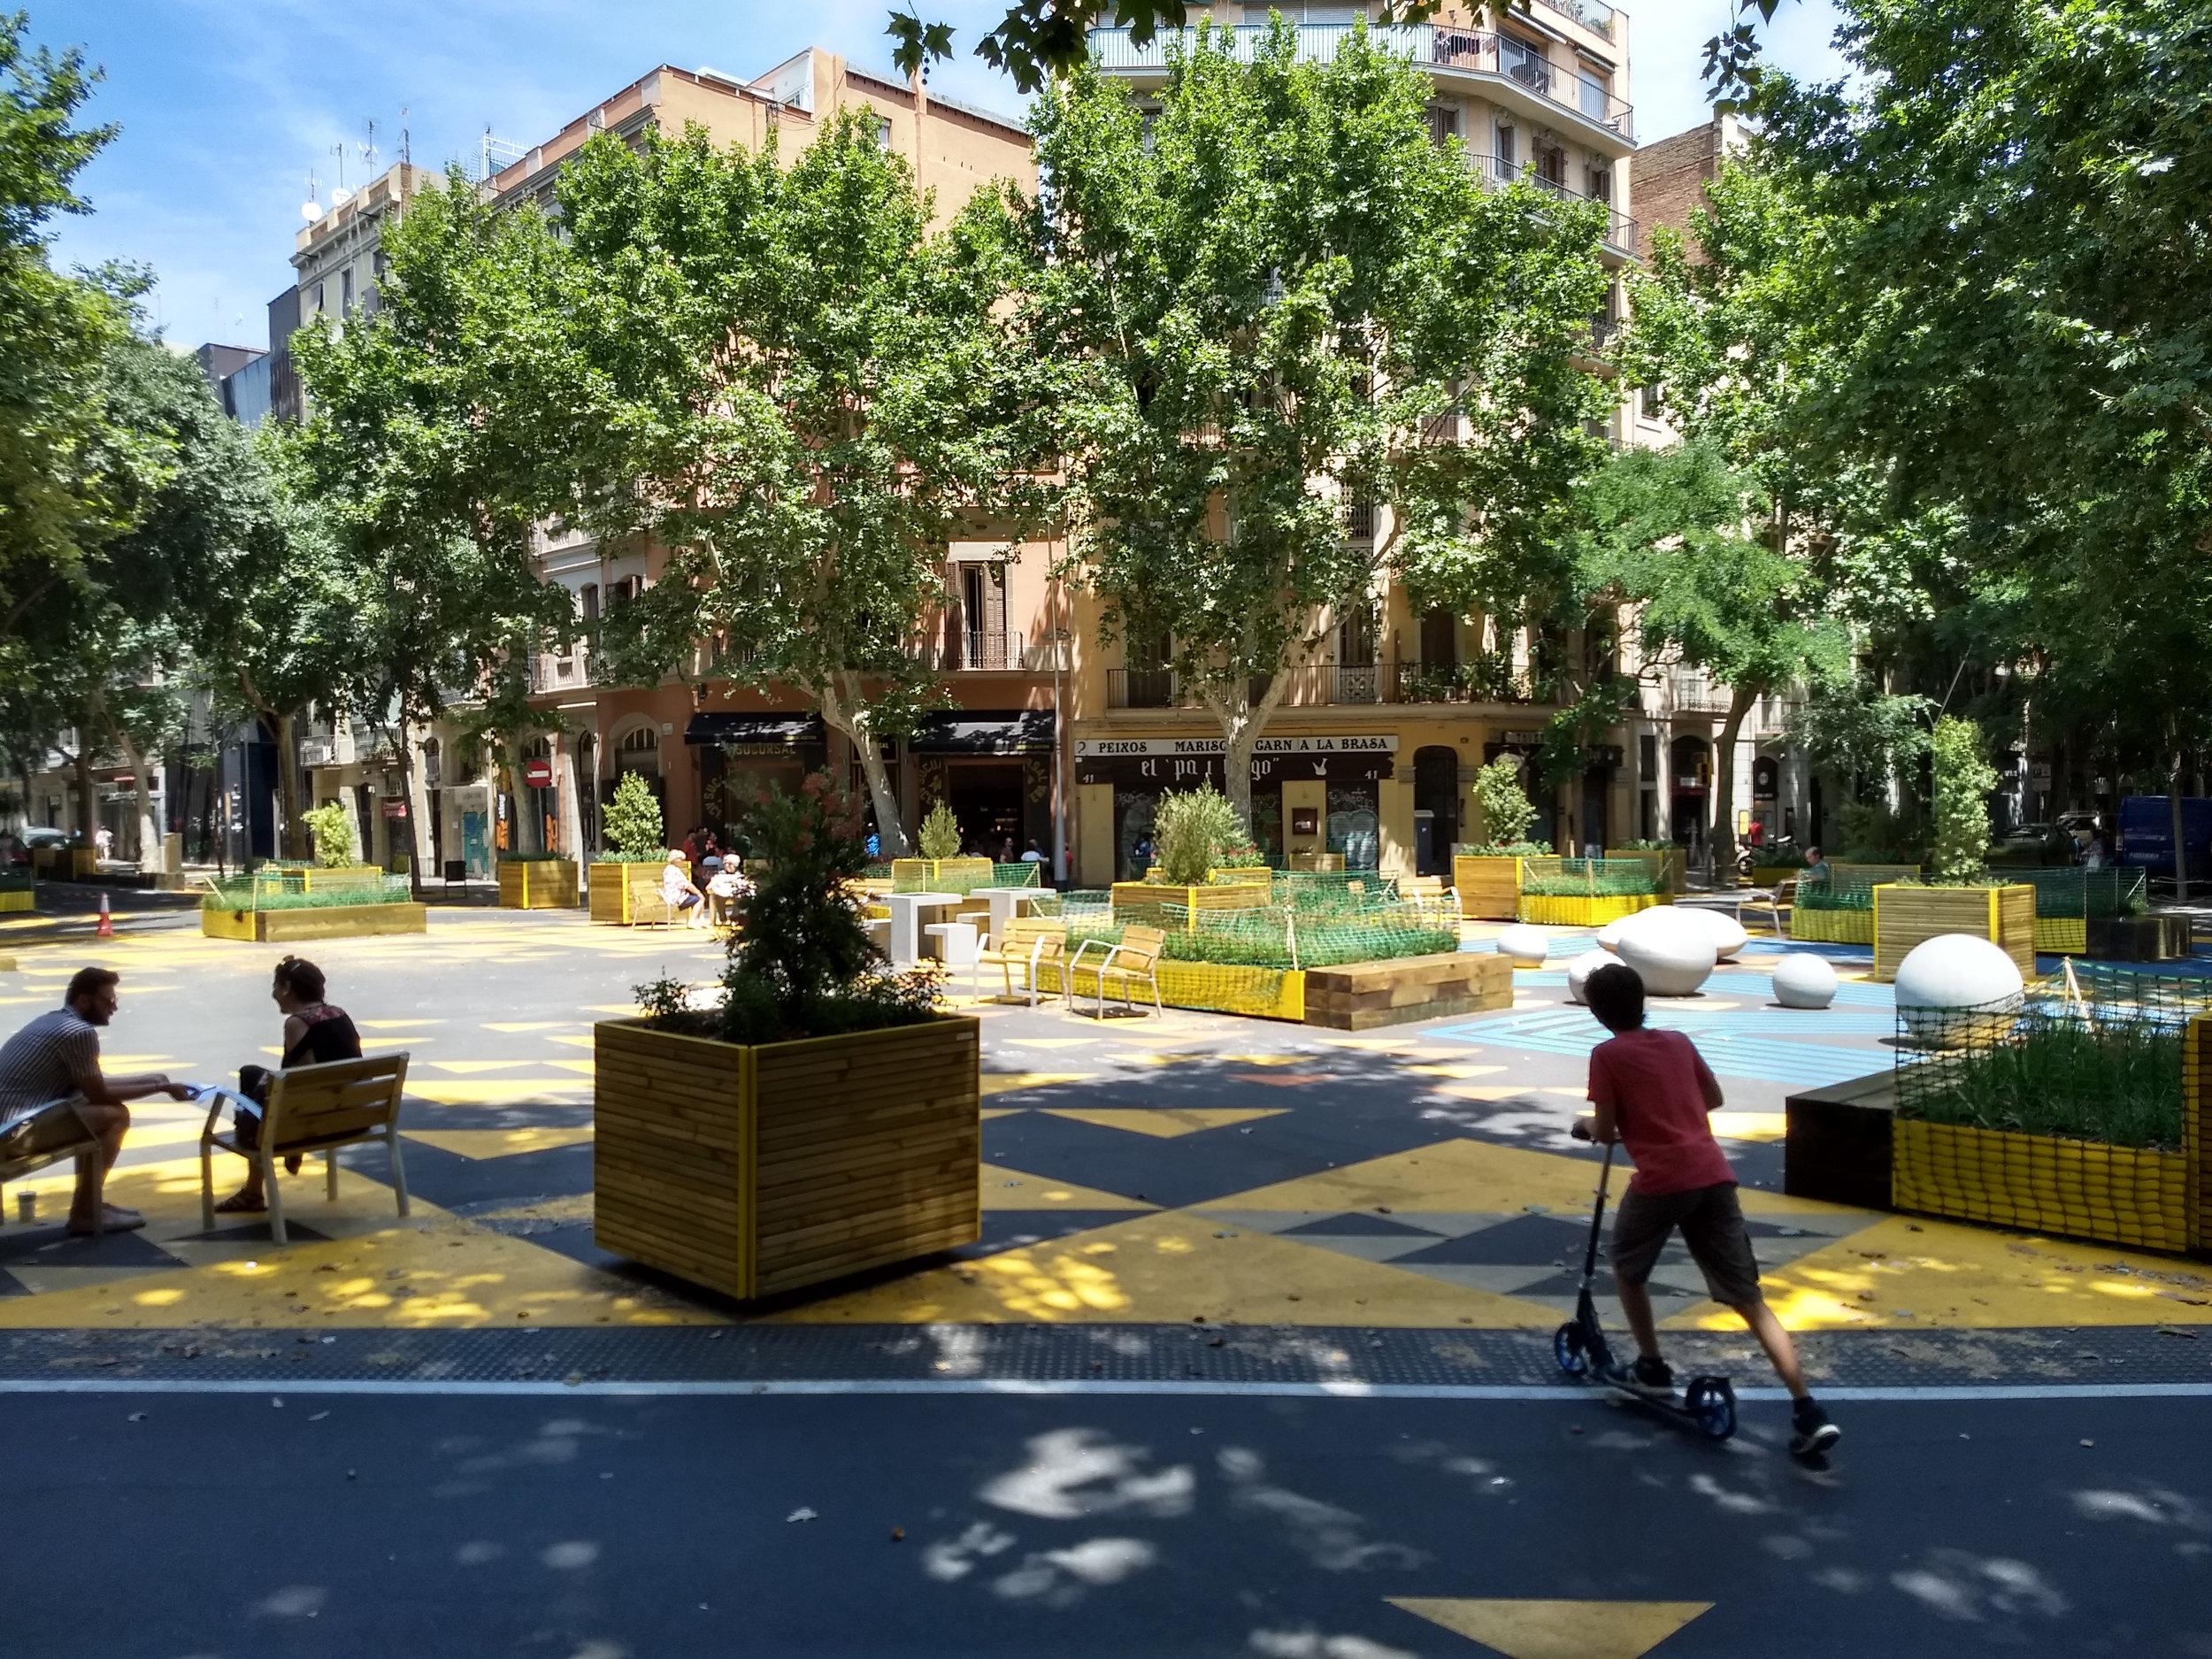 Le projet Super-Blocks à Barcelone (photo de Ioana Valero)